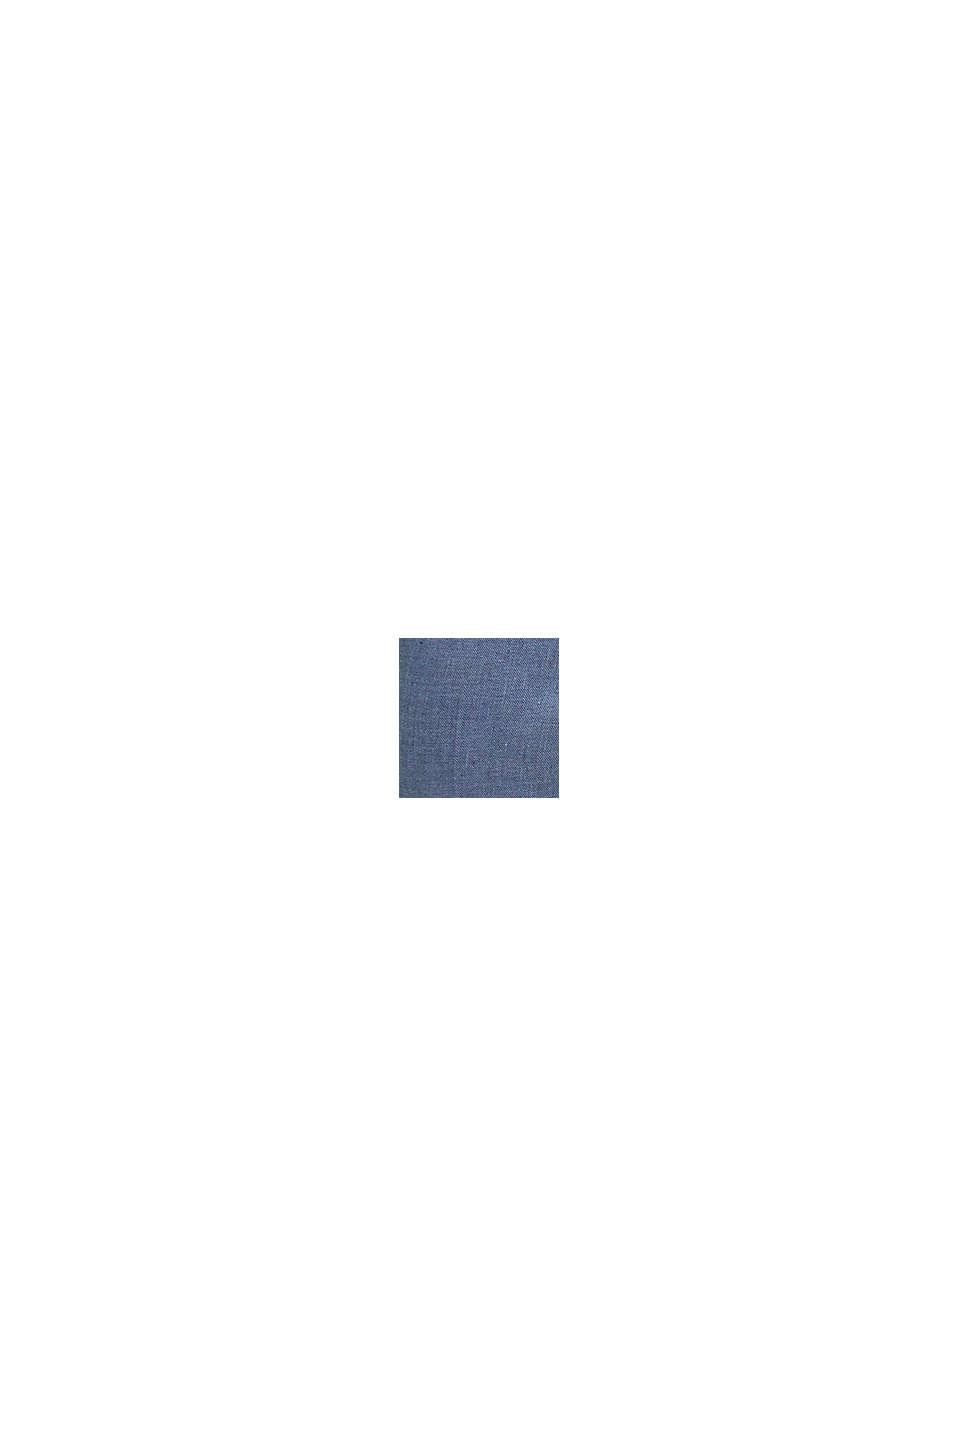 FIL-A-FIL I hørmix: bukser, BLUE, swatch